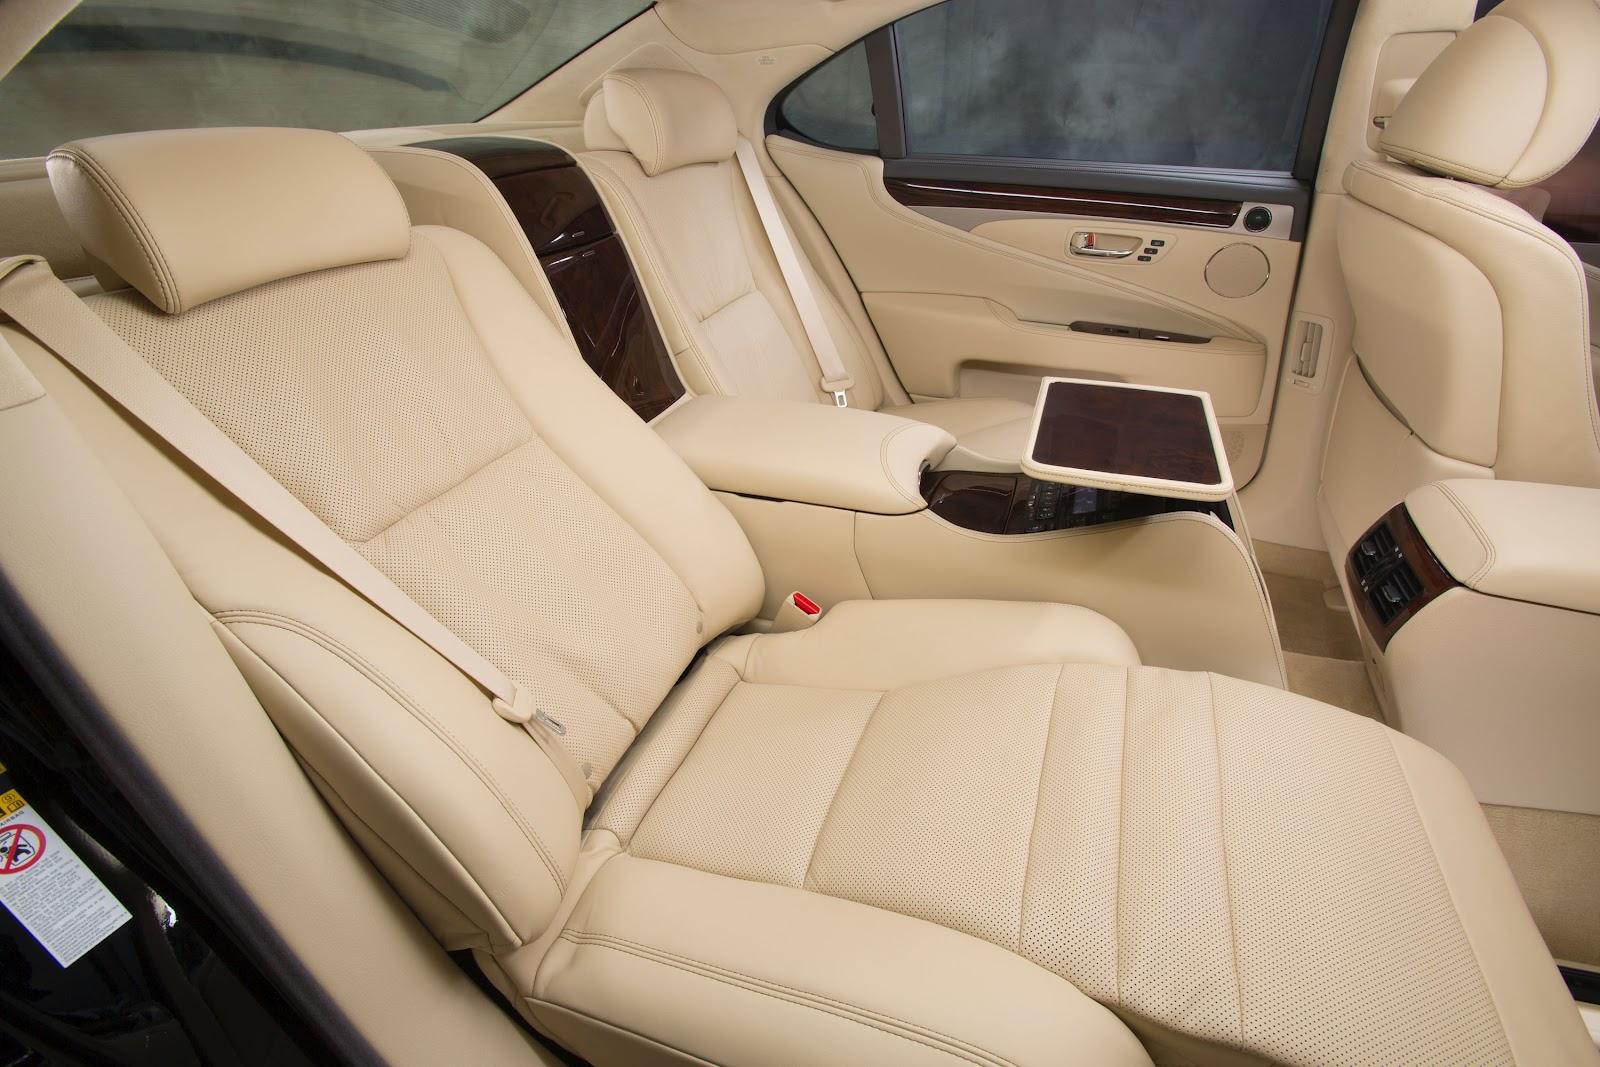 http://3.bp.blogspot.com/-RSJm6EOyotM/UBe5kvINhKI/AAAAAAAAE78/Ucwgr8UgUfU/s1600/2013_Lexus_LS_460_L_interior_002_50488A9DC1DC00AD7CE474B0BA57A343D1257BED.jpg